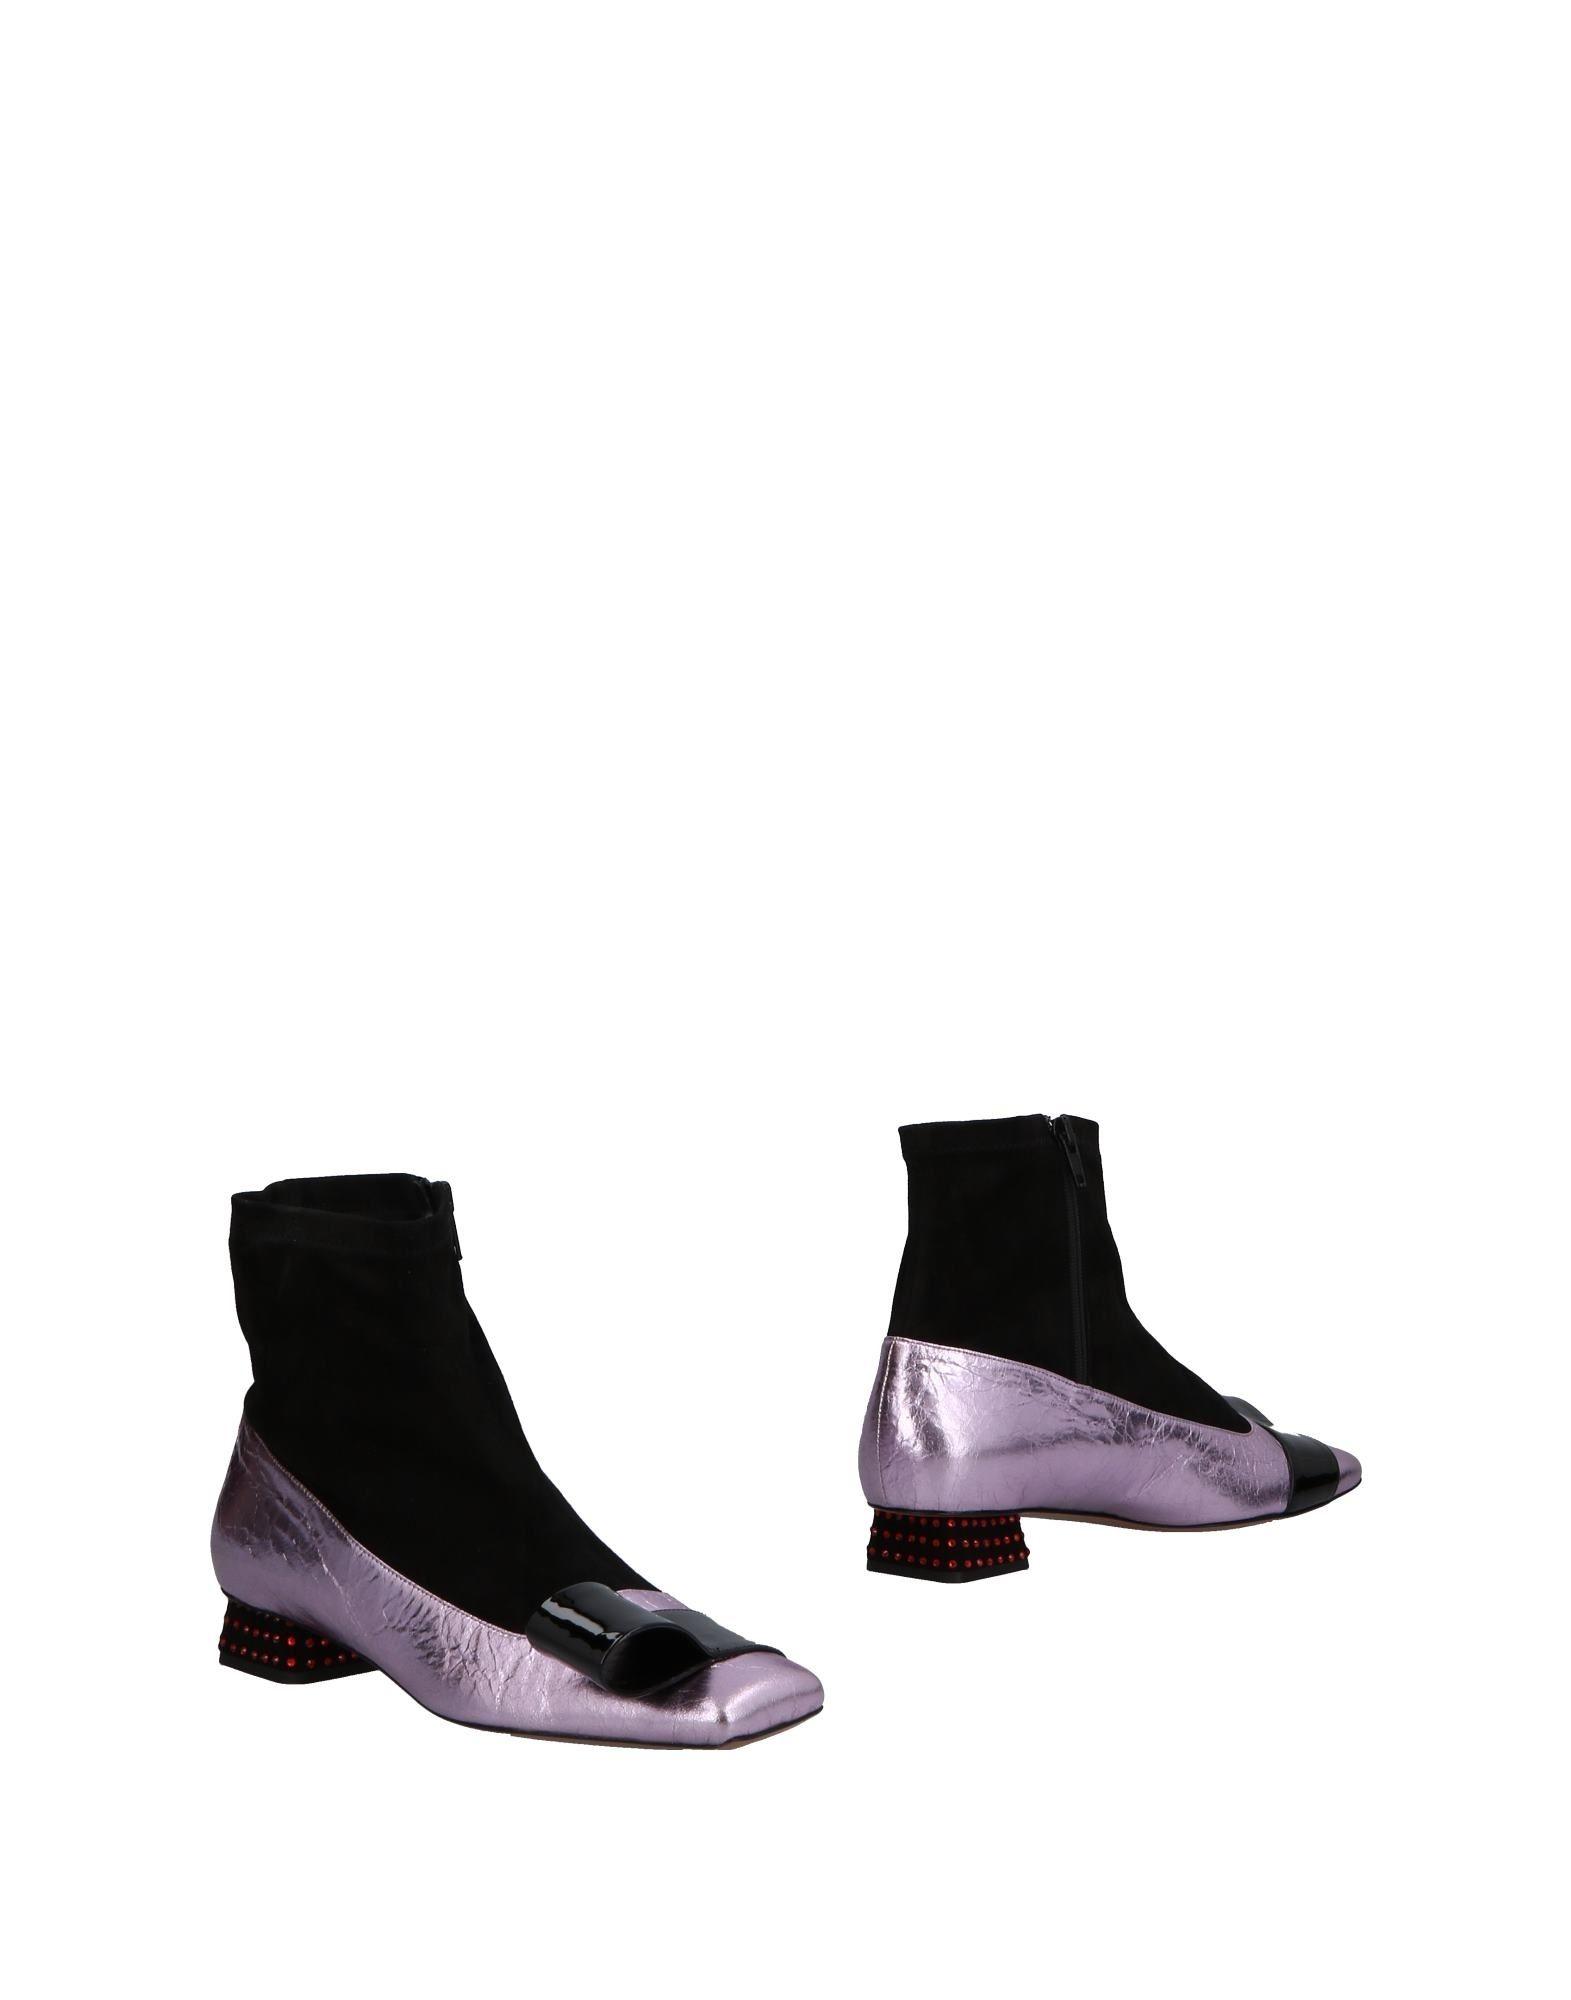 Rabatt Schuhe Rayne Damen Stiefelette Damen Rayne  11499208XW 83a5f8